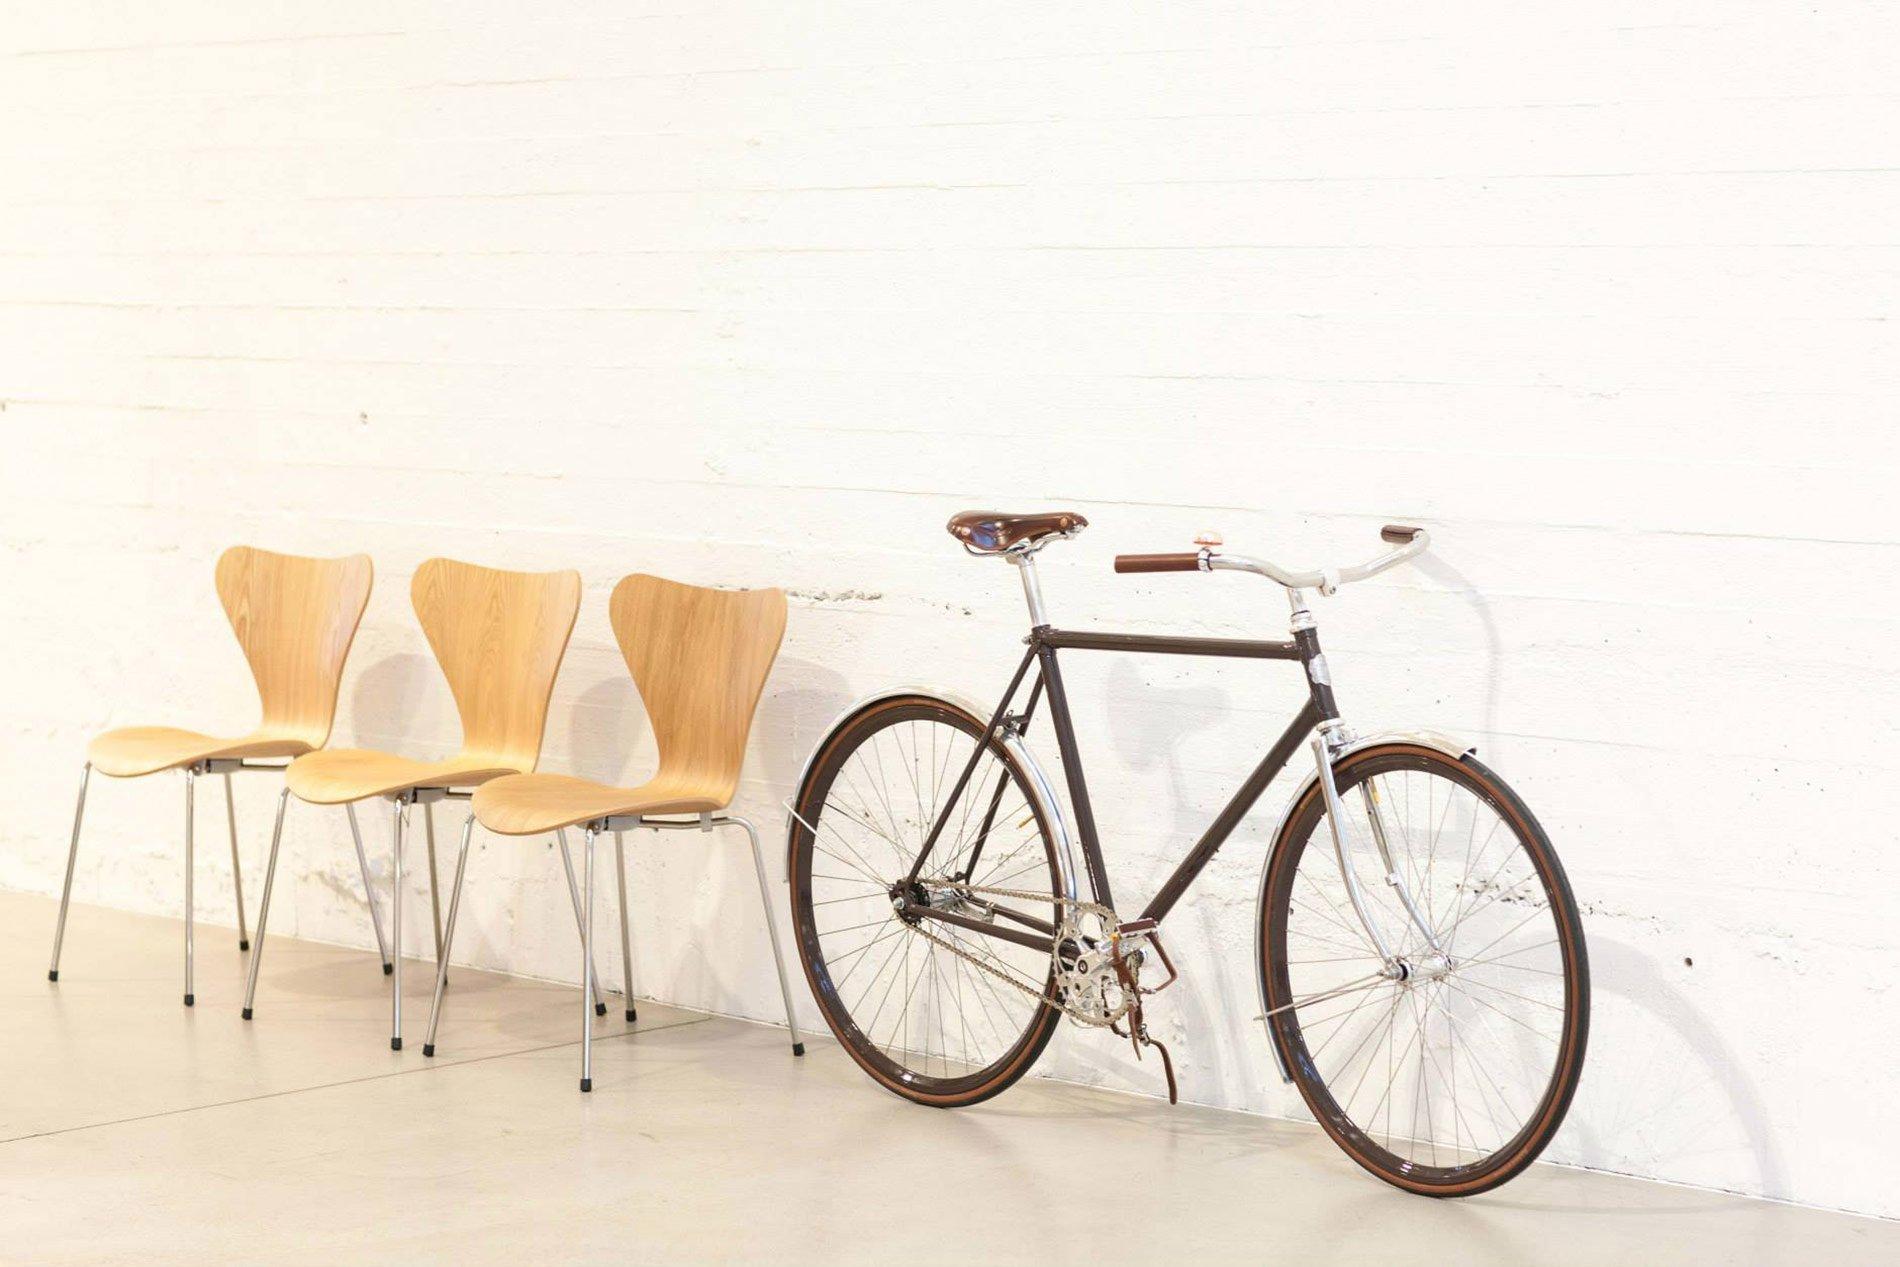 velorbis_fritz_hansen_urban_retro_bicycle_5